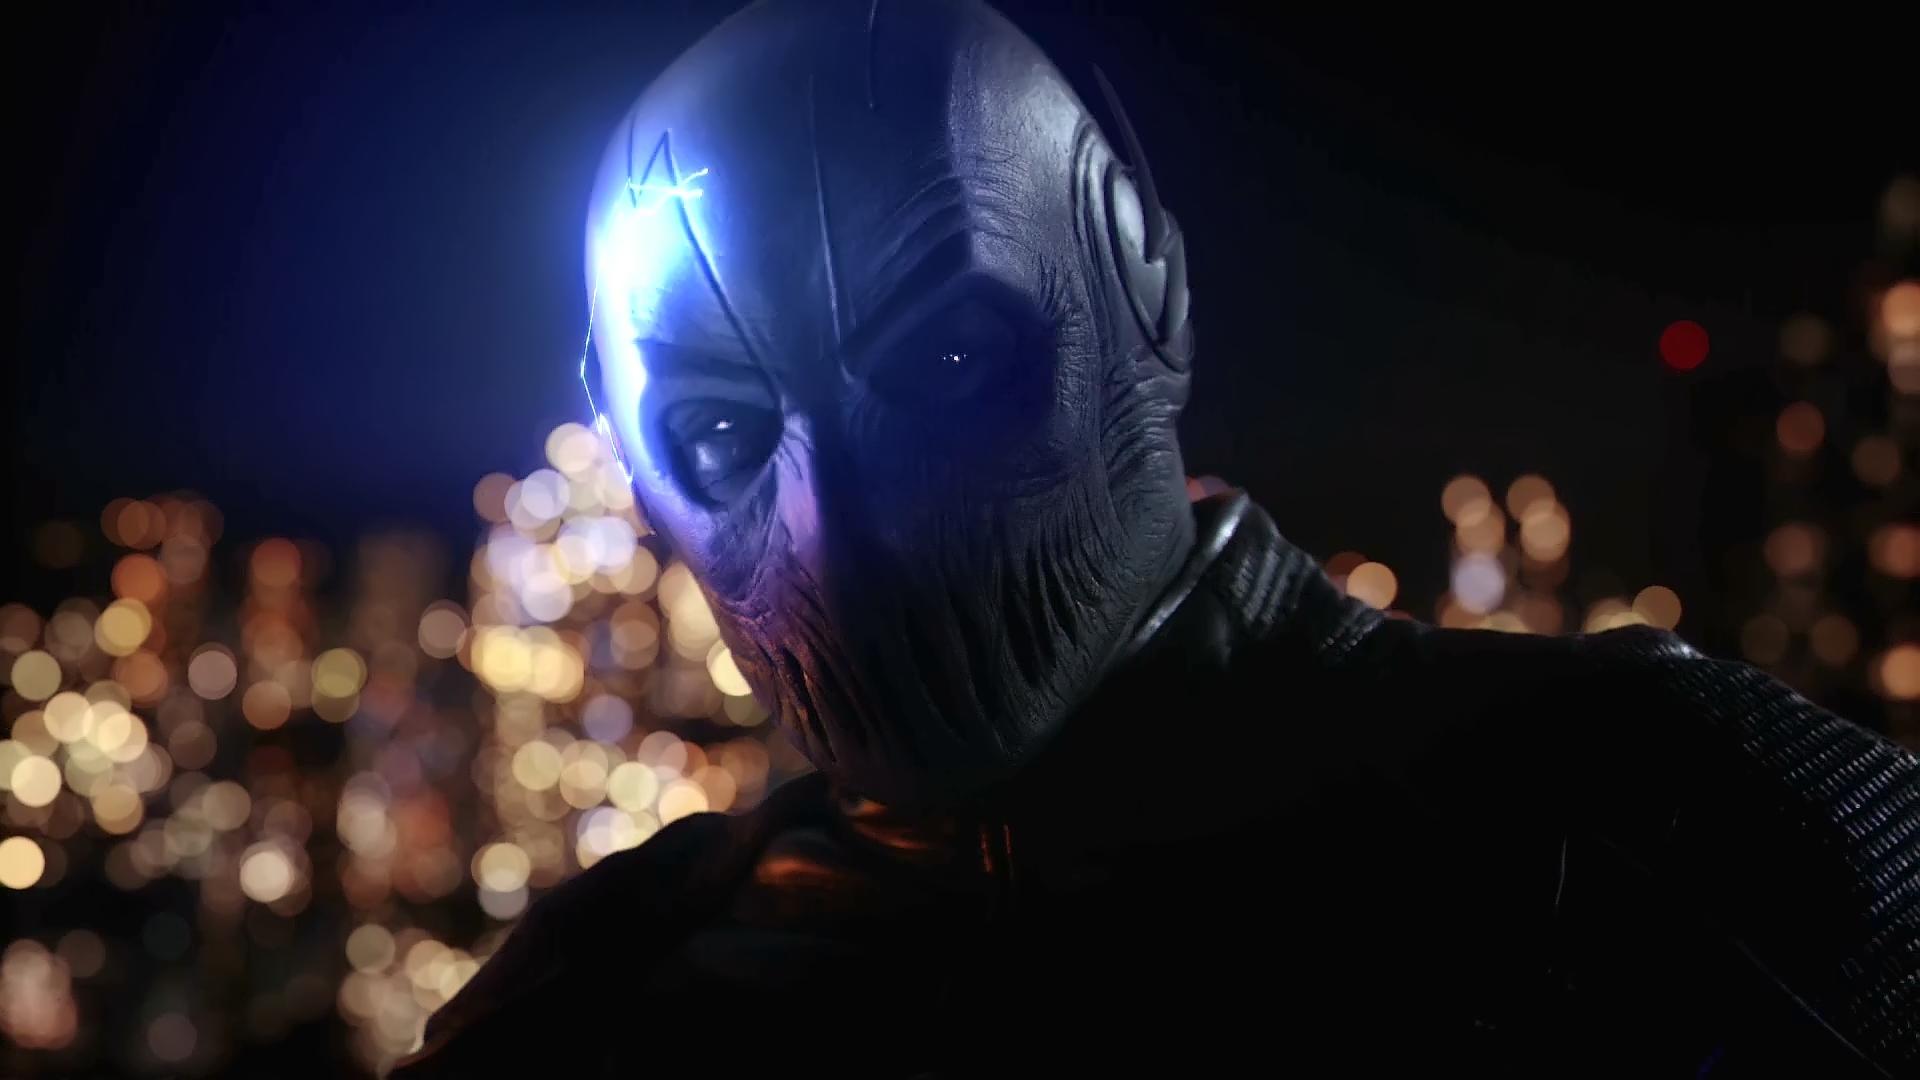 Wallpaper : night, original characters, The Flash, performance